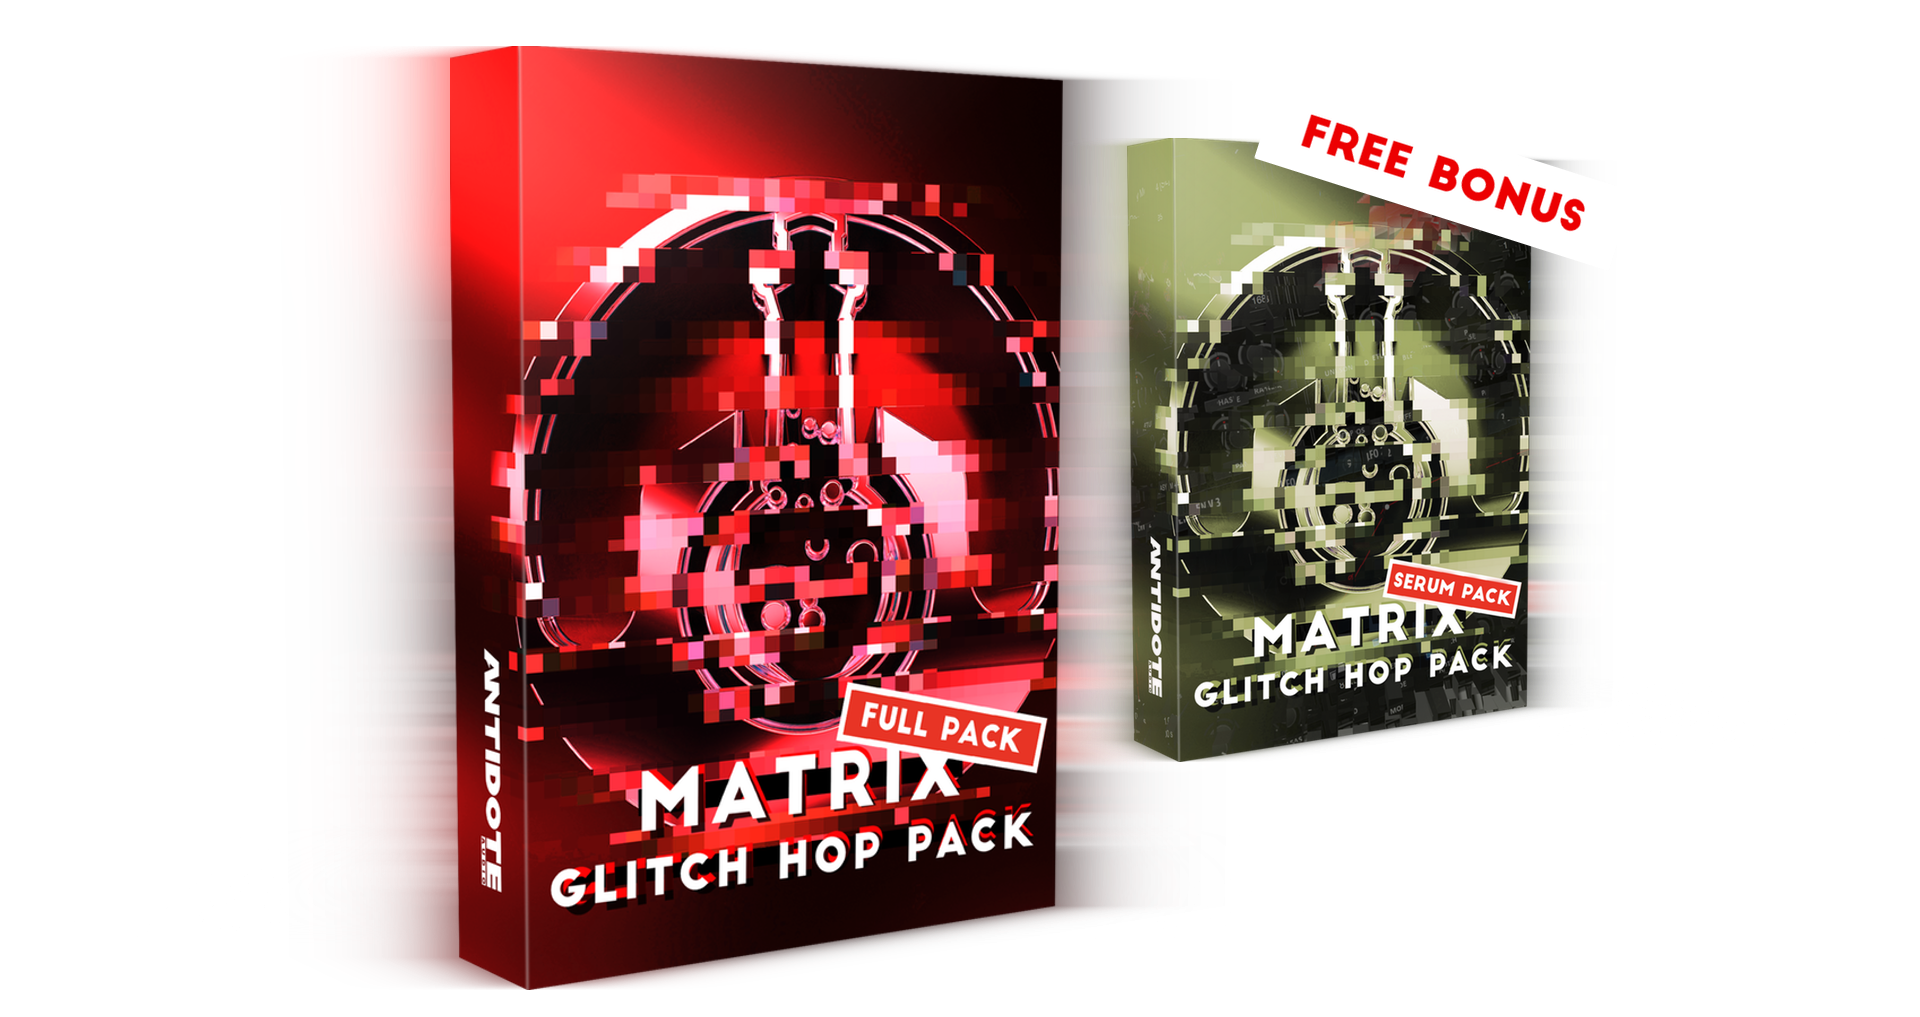 free pack bonus